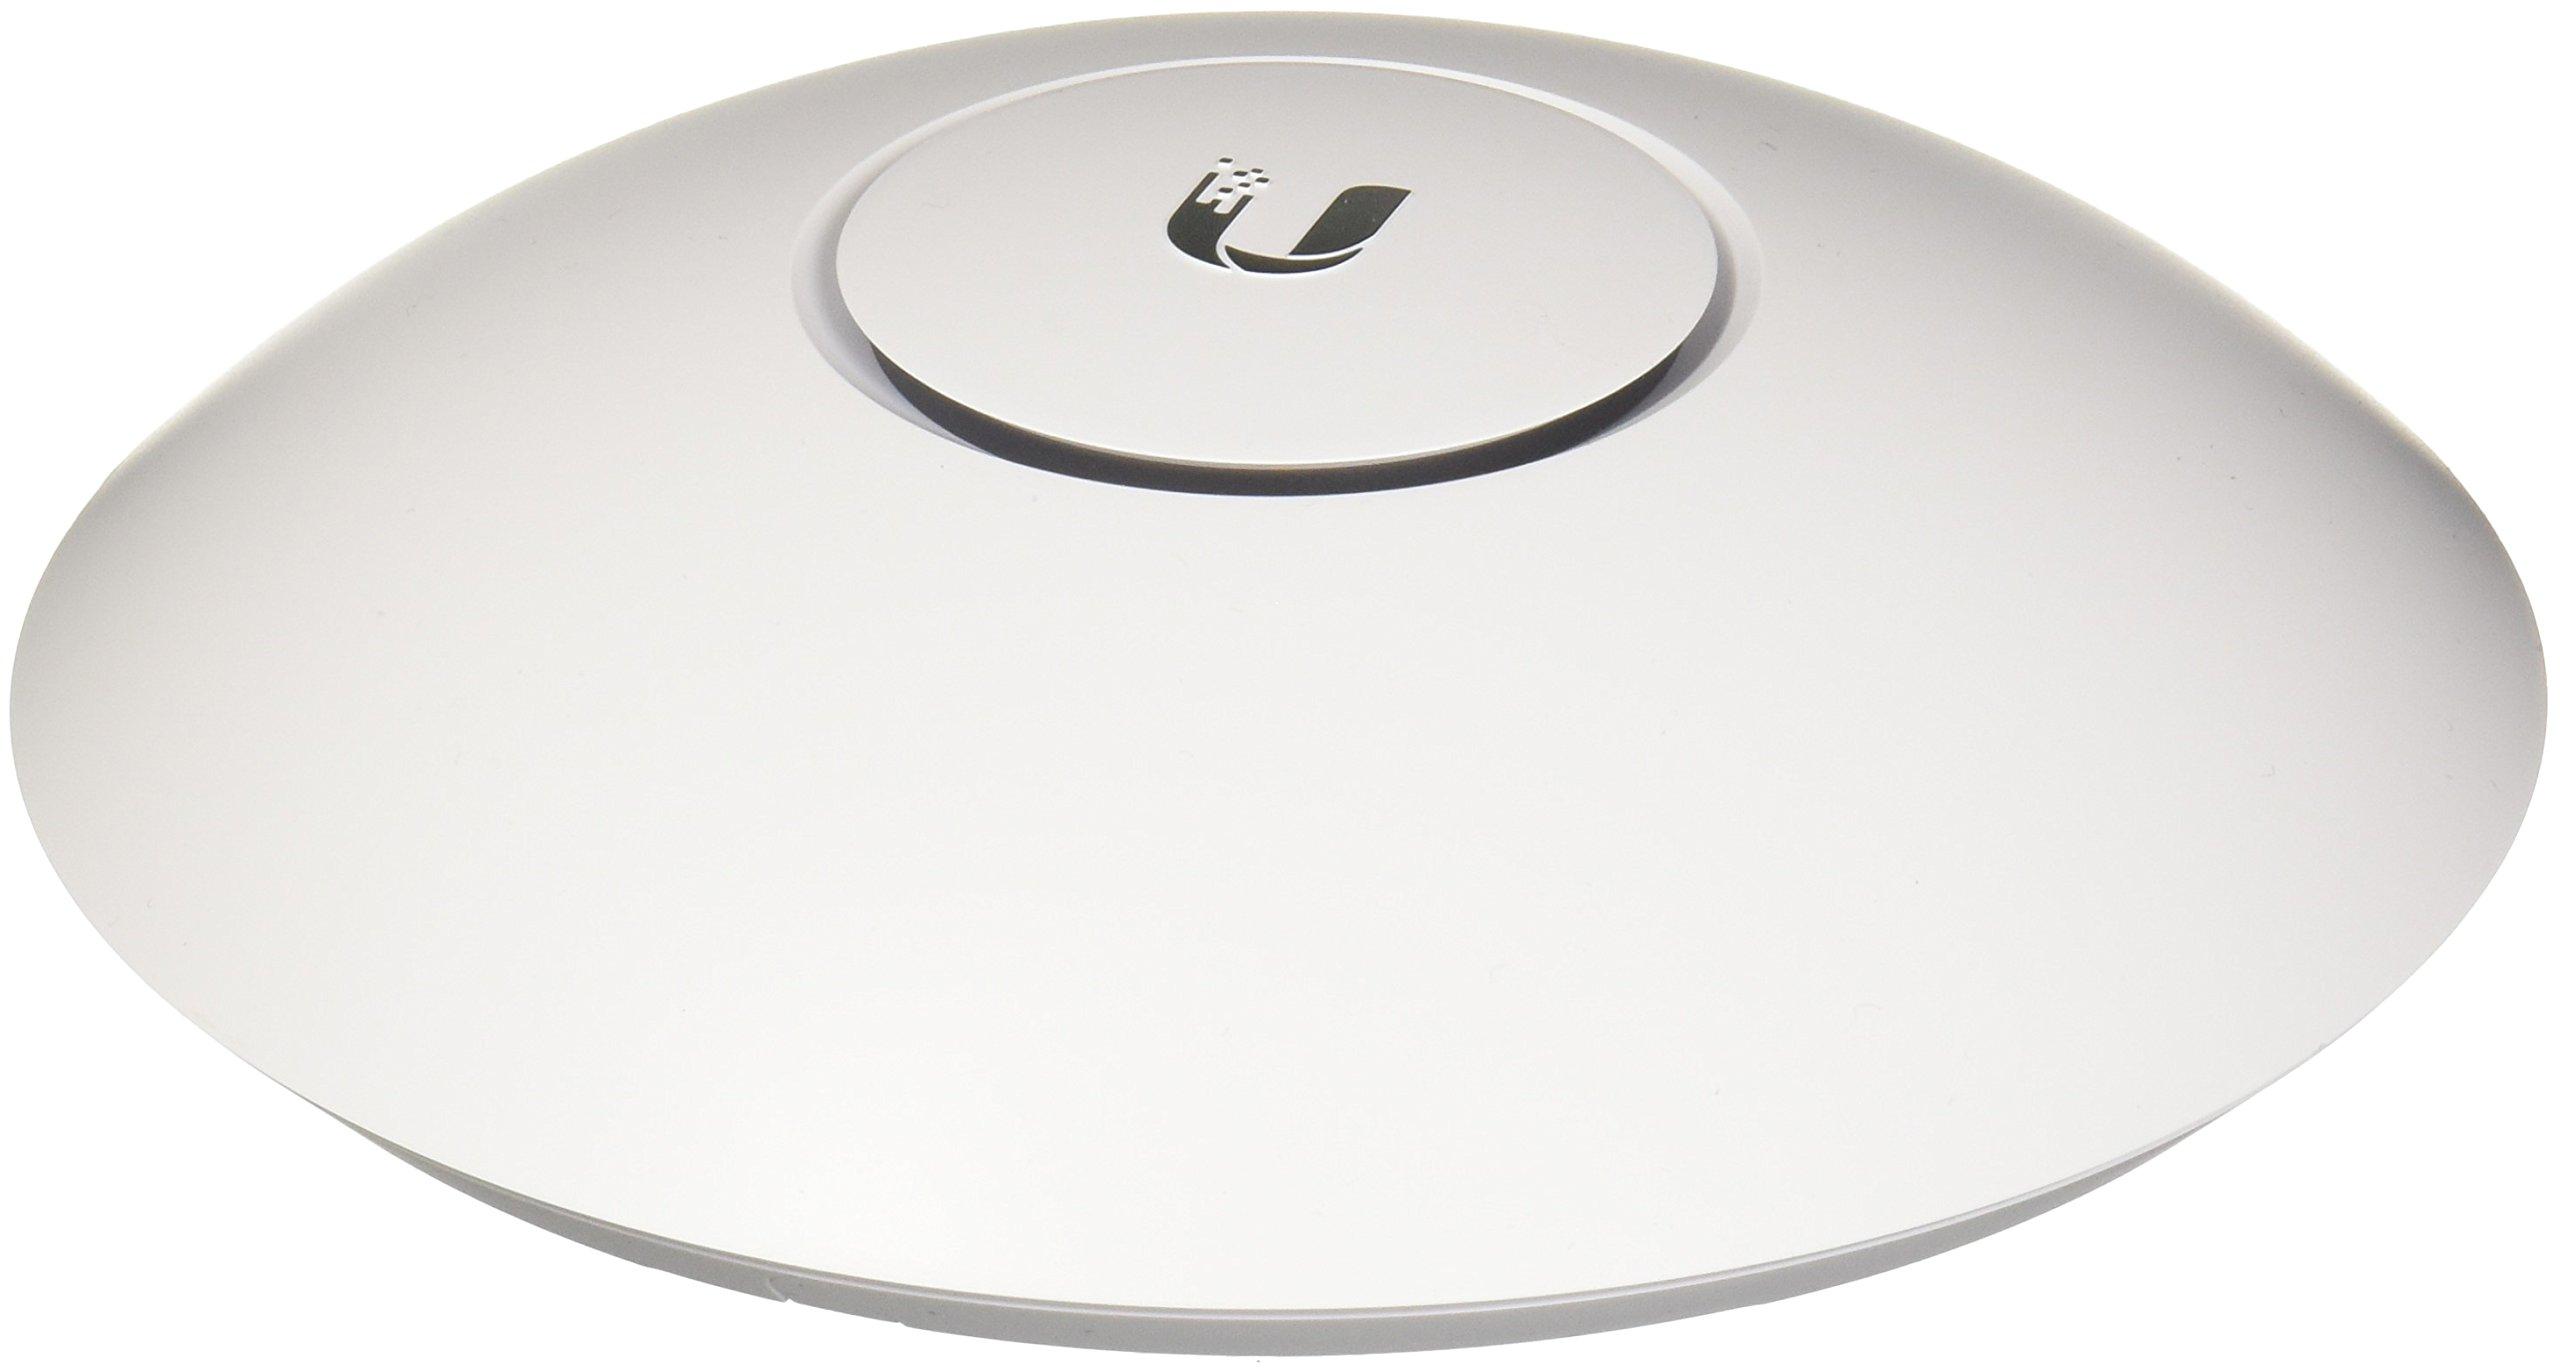 Ubiquiti Unifi Ap-AC Long Range - Wireless Access Point - 802.11 B/A/G/n/AC (UAPACLR5US) by Ubiquiti Networks